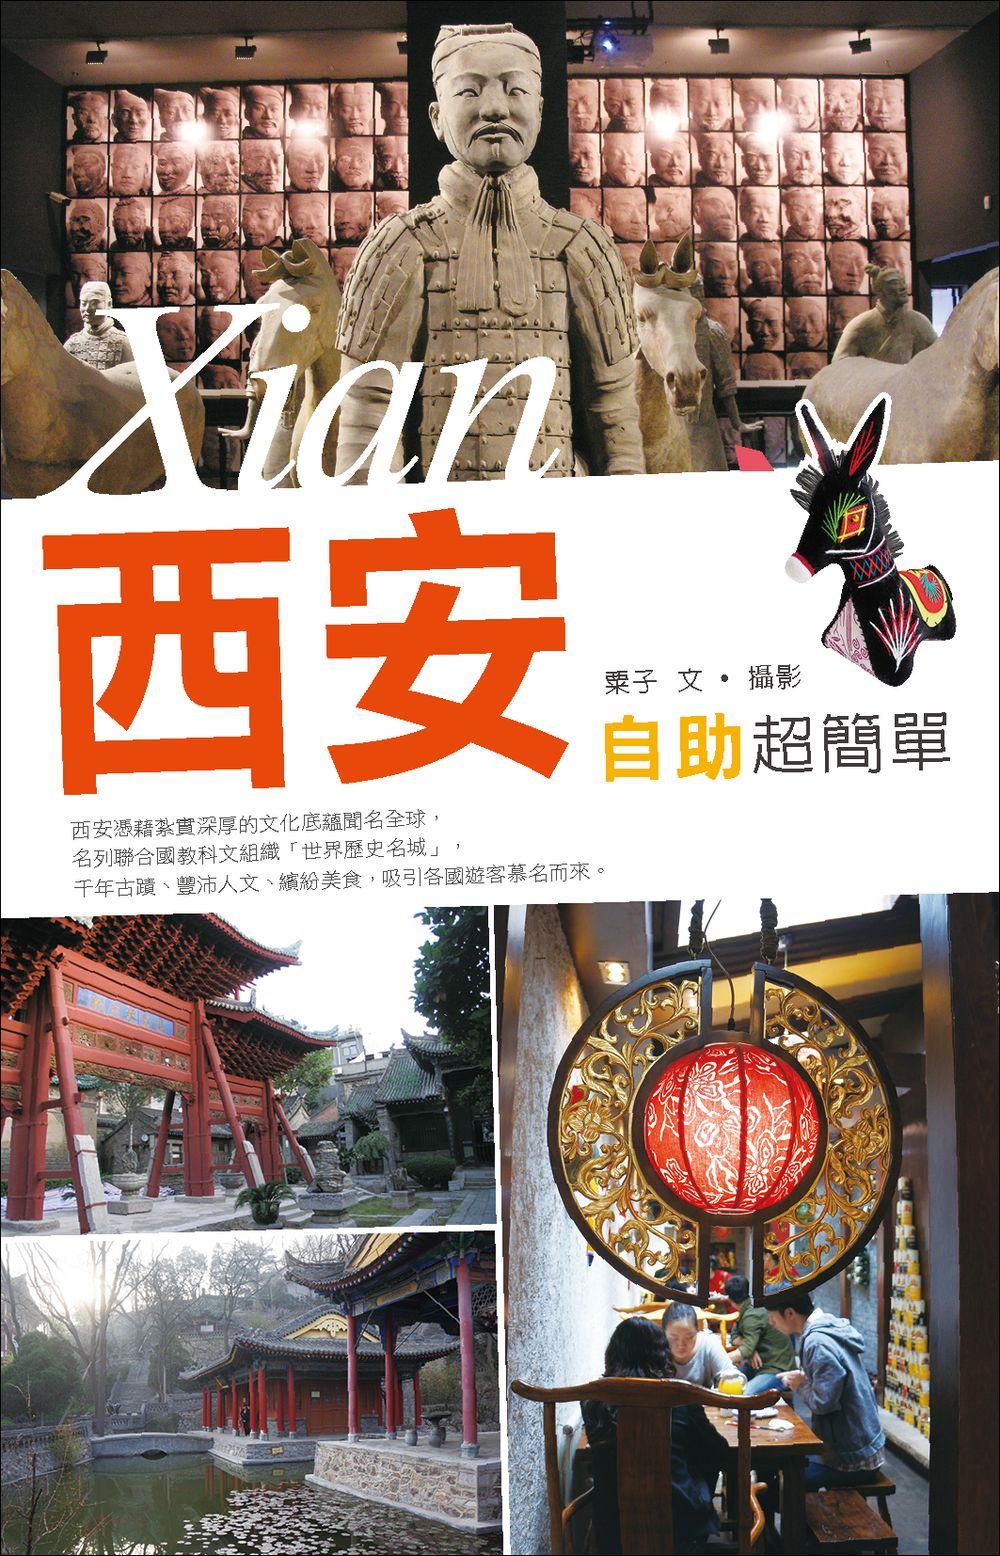 http://im2.book.com.tw/image/getImage?i=http://www.books.com.tw/img/001/064/78/0010647808_bc_01.jpg&v=53f70dd0&w=655&h=609